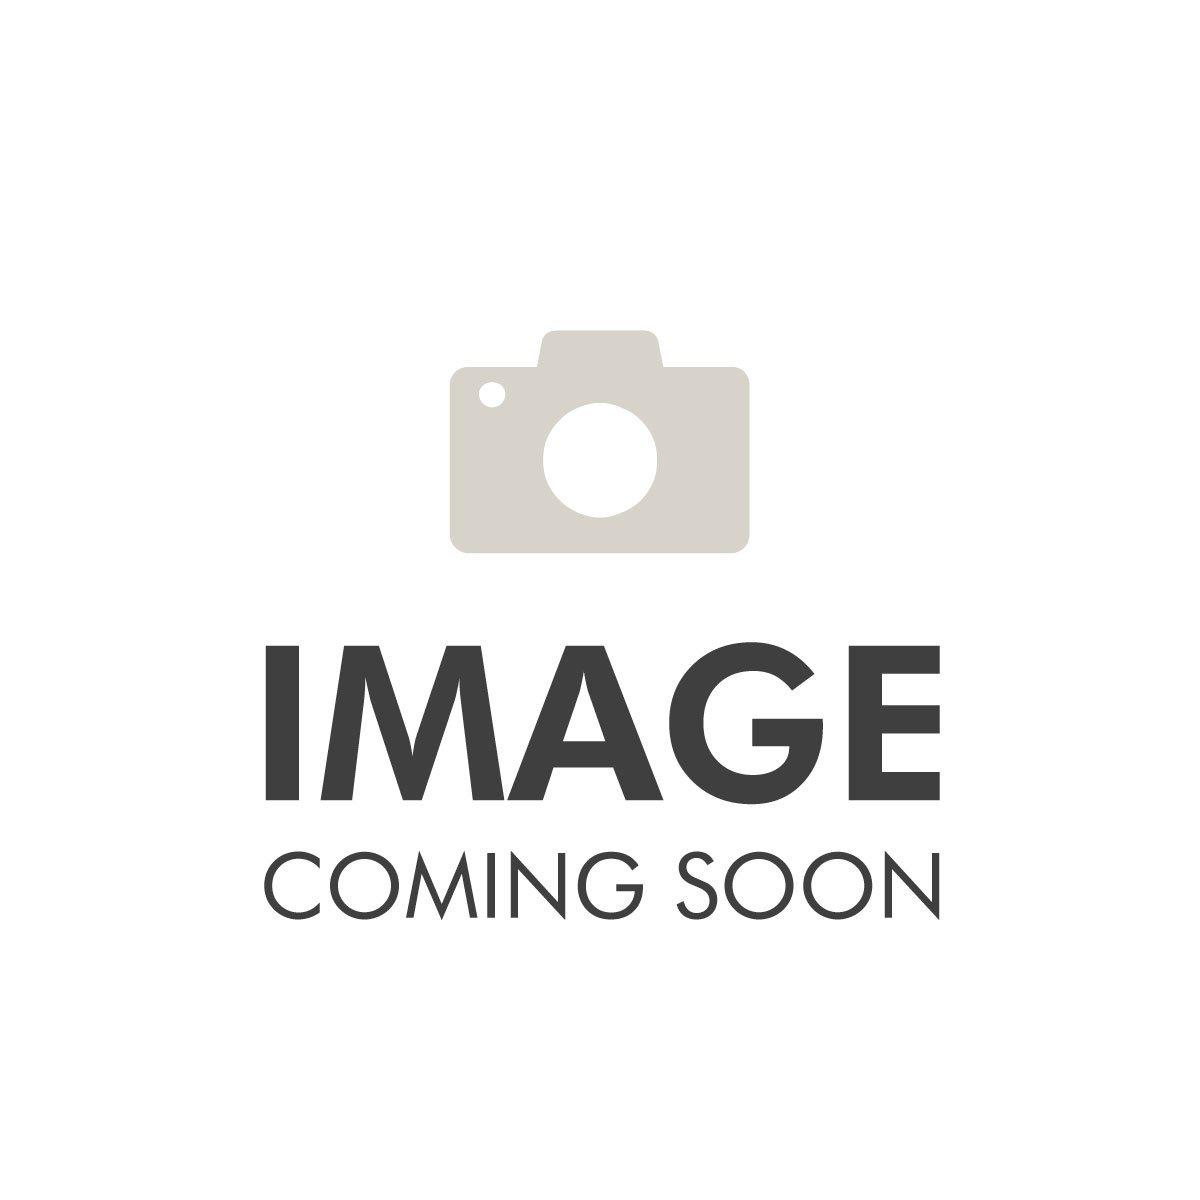 Britney Spears Fantasy EDP Spray 30ml / Body Souffle / Shower Gel 50ml